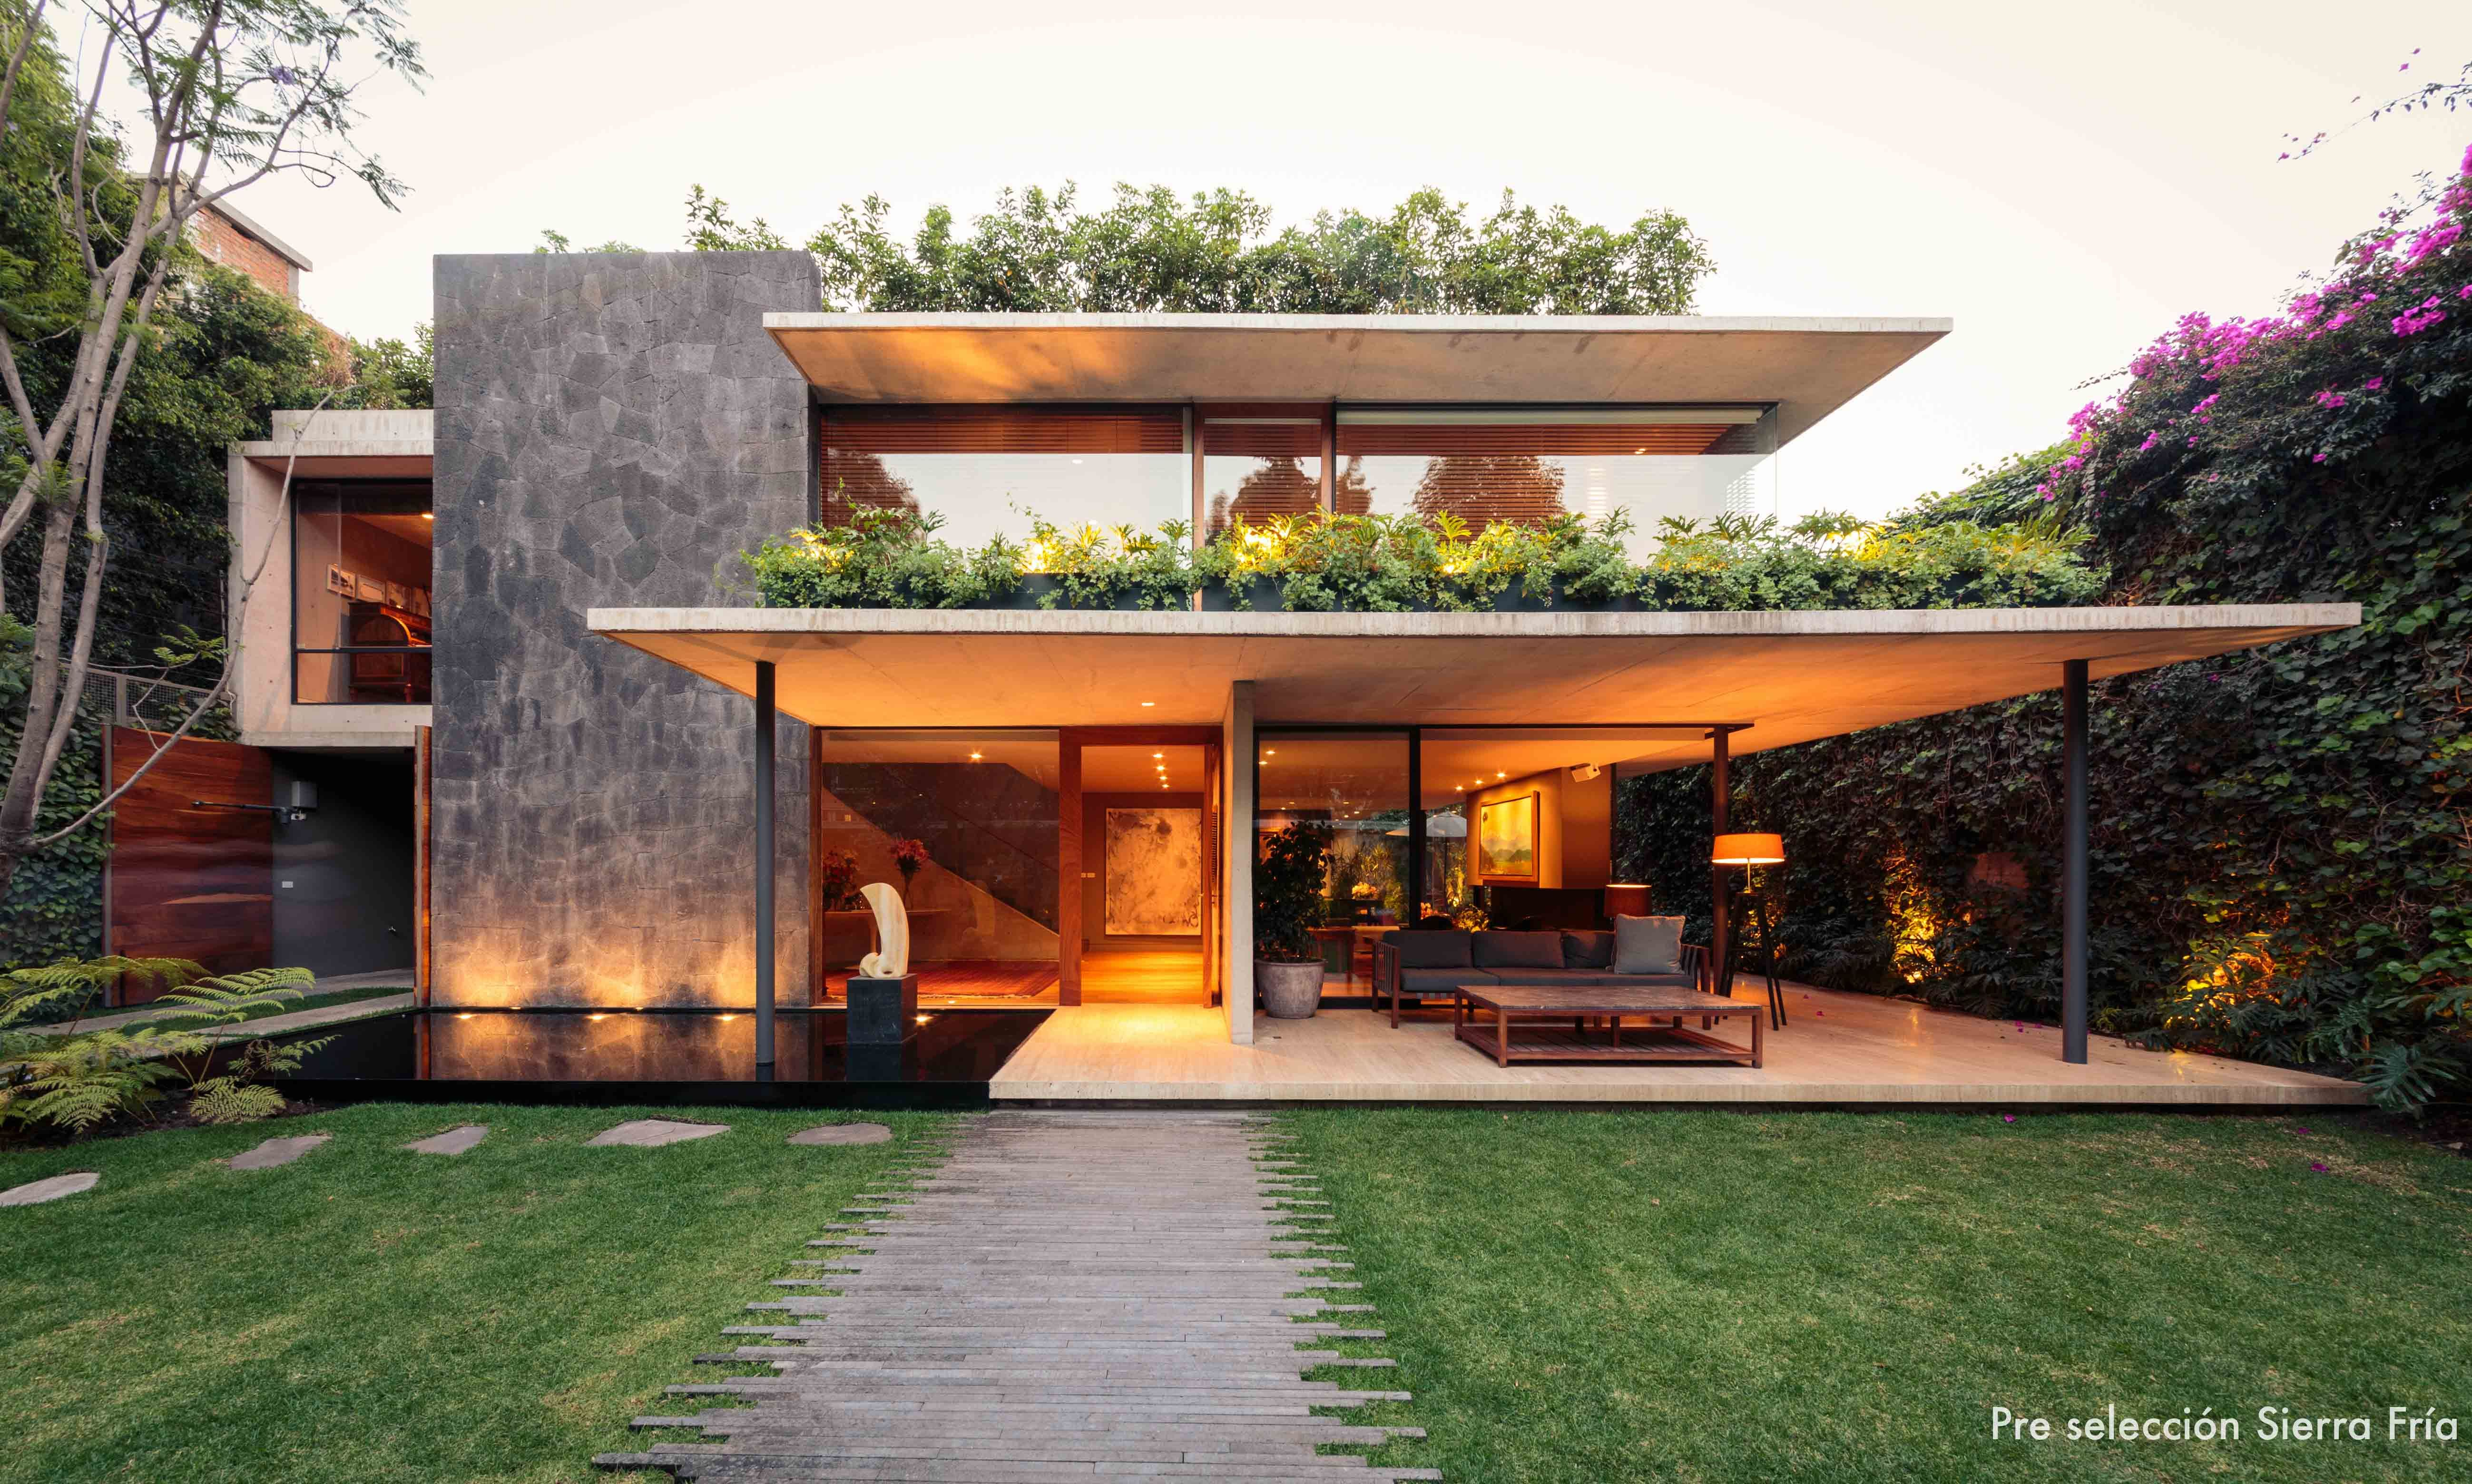 Casa sierra fria m xico d f jose juan rivera rio for Arquitectos de la arquitectura moderna